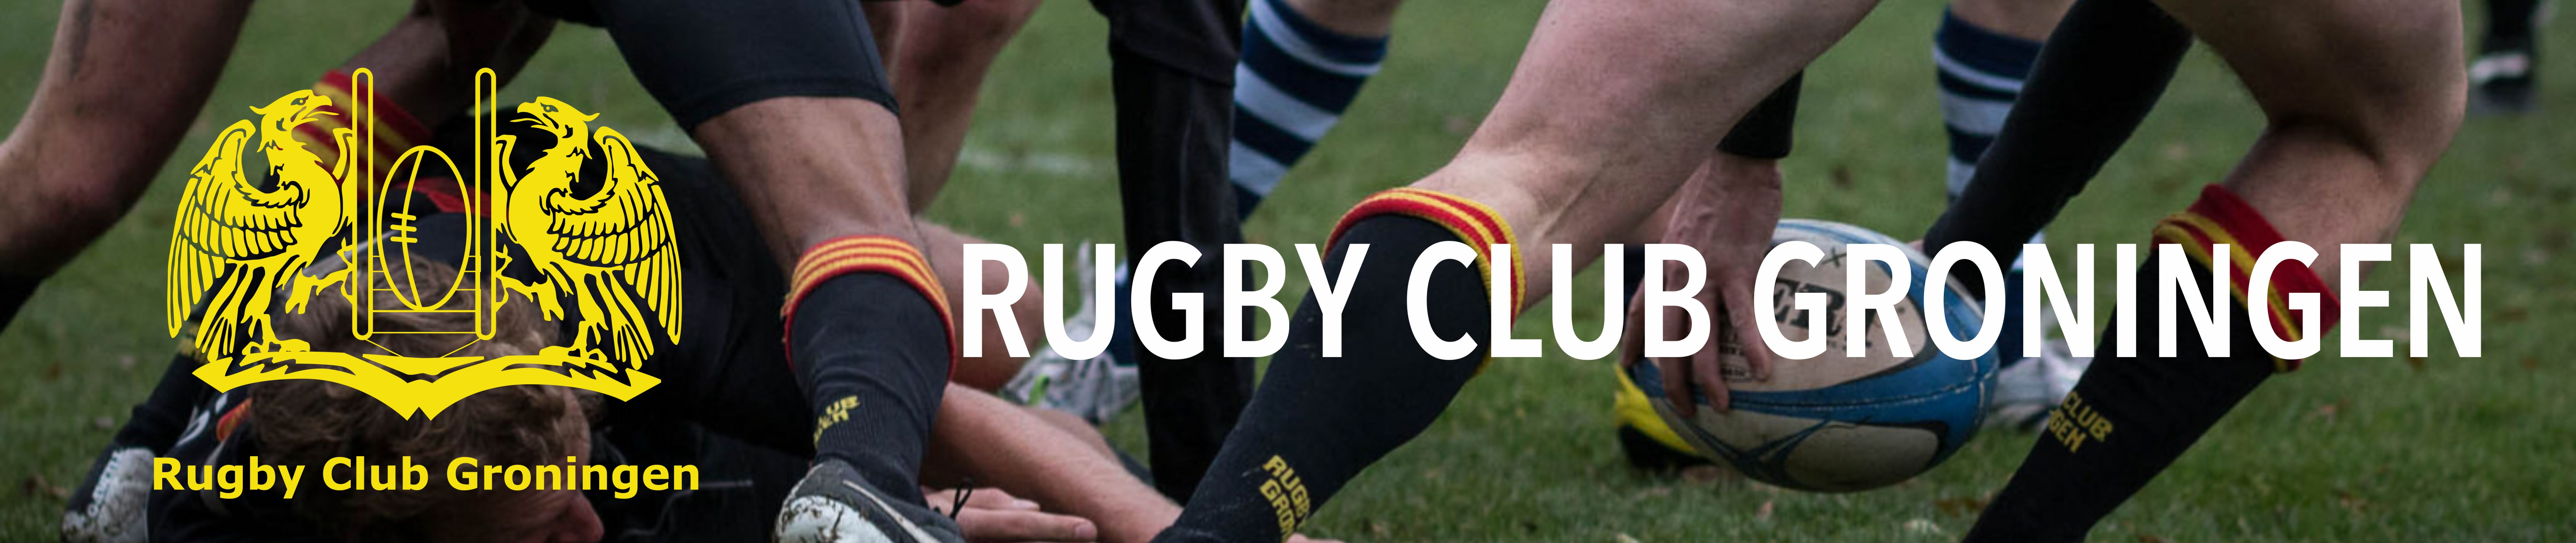 Rugbyclub Groningen